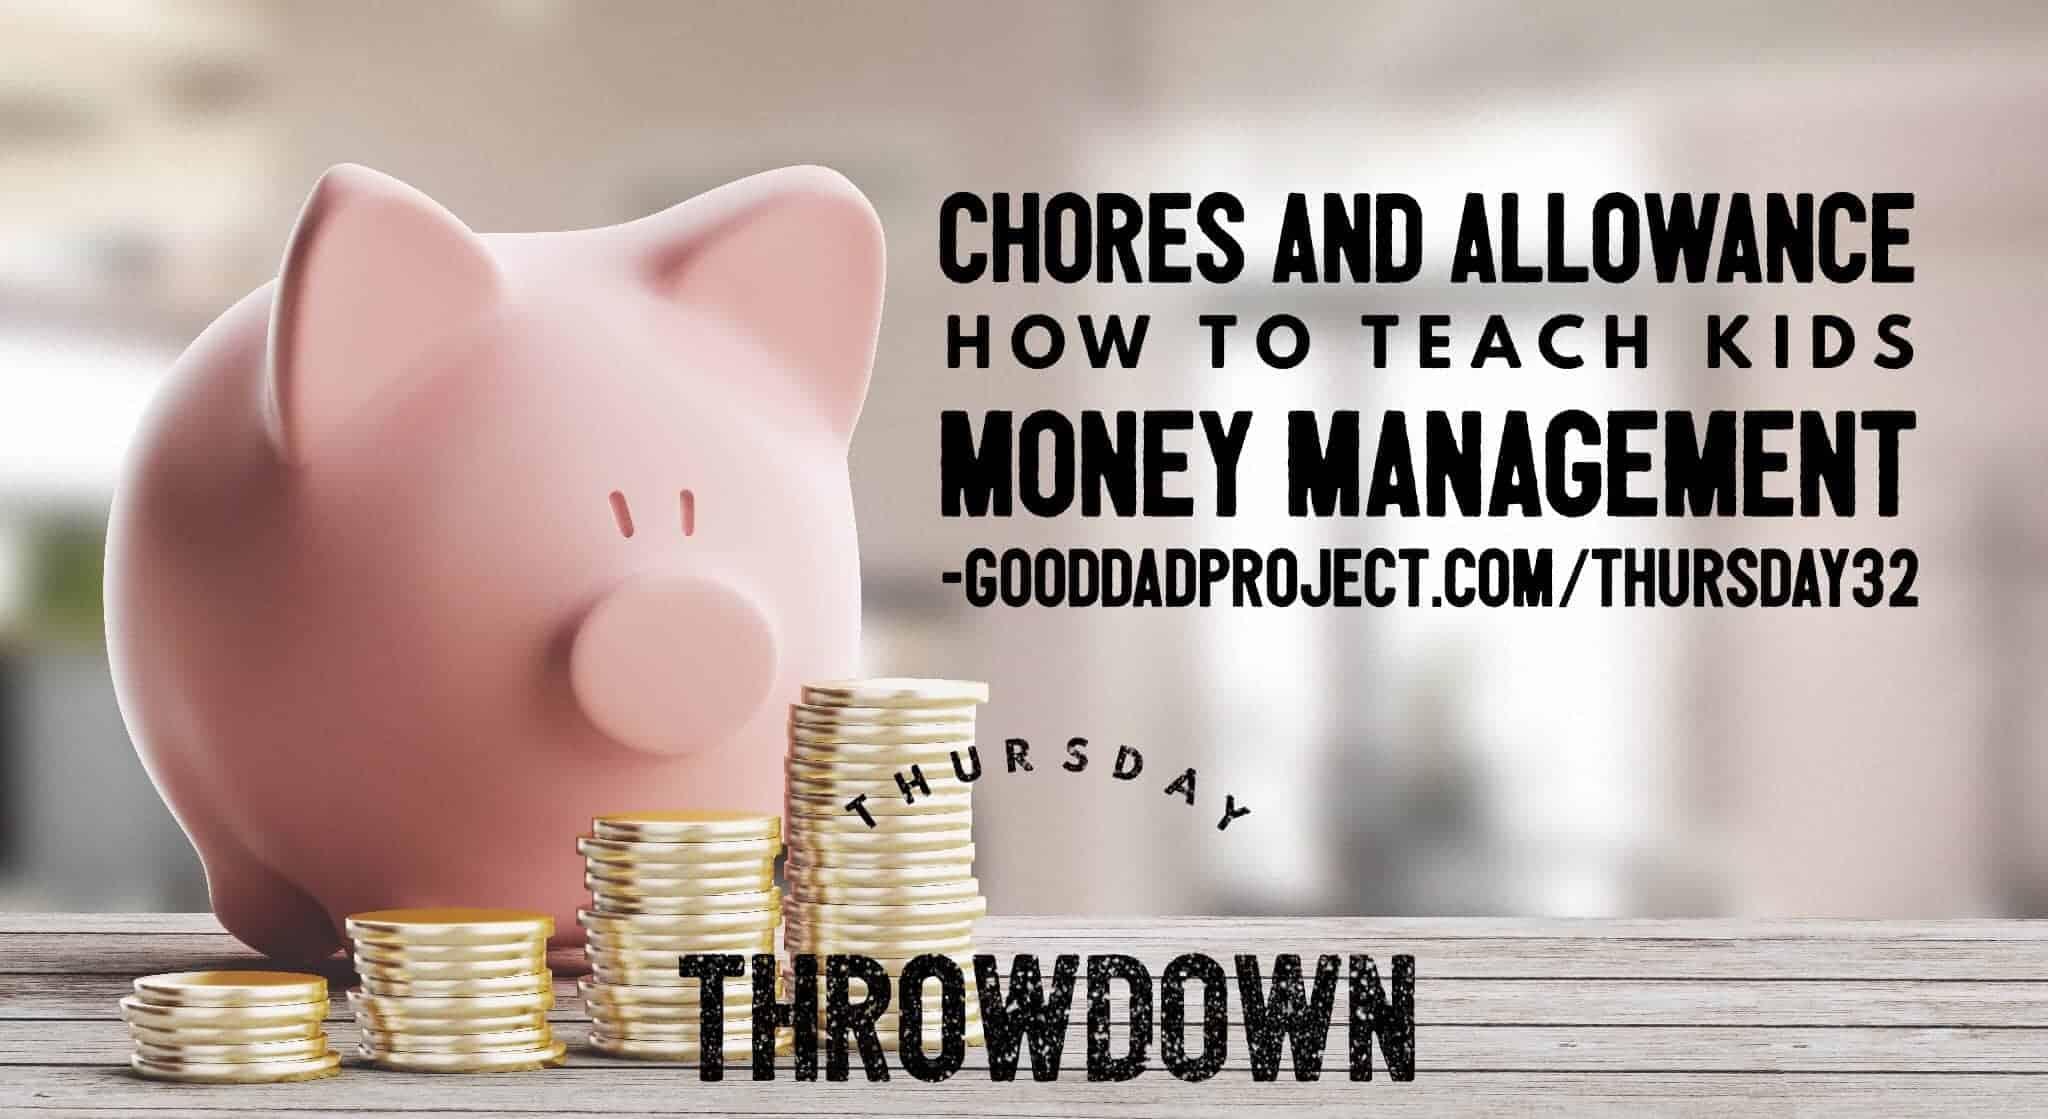 chores and allowance